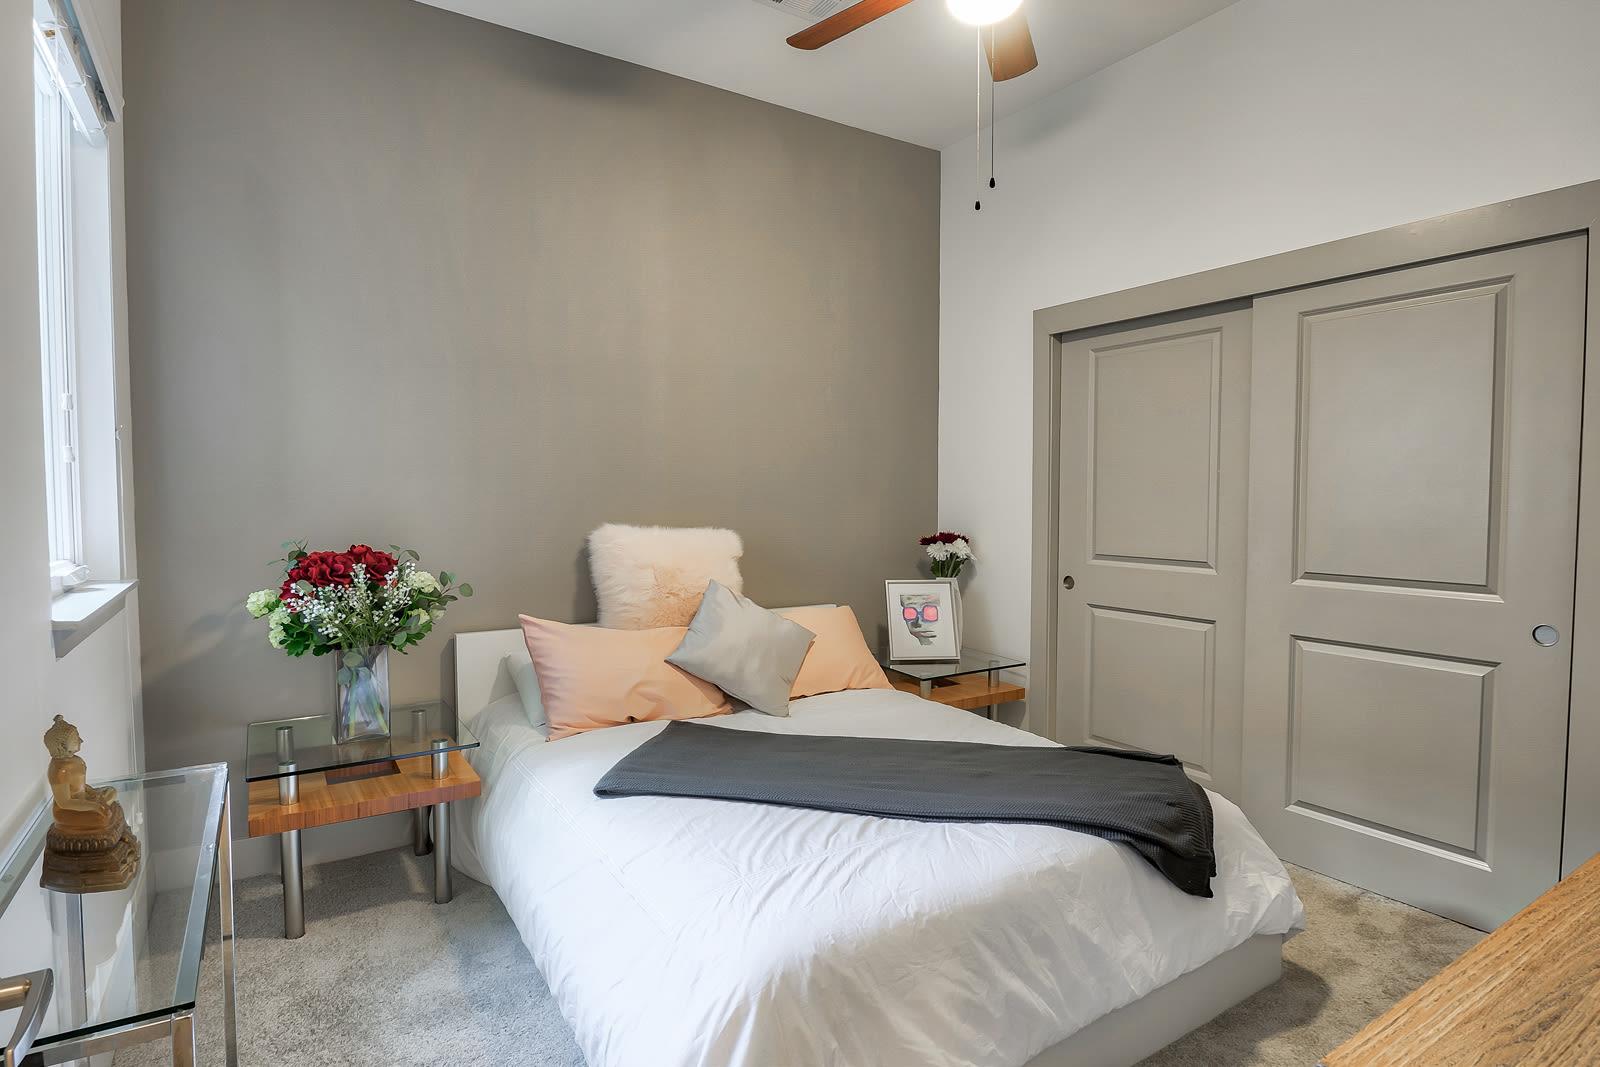 Plush Carpeting in Bedrooms at 1000 Grand by Windsor, California, 90015